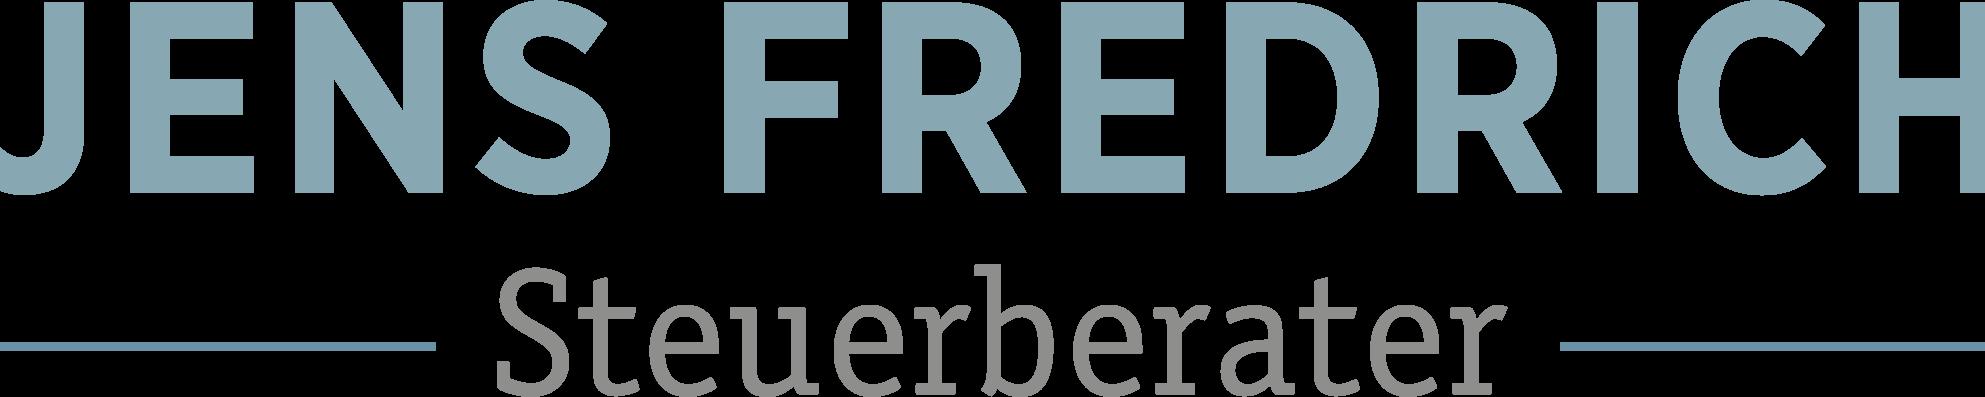 Jens Fredrich Steuerberater